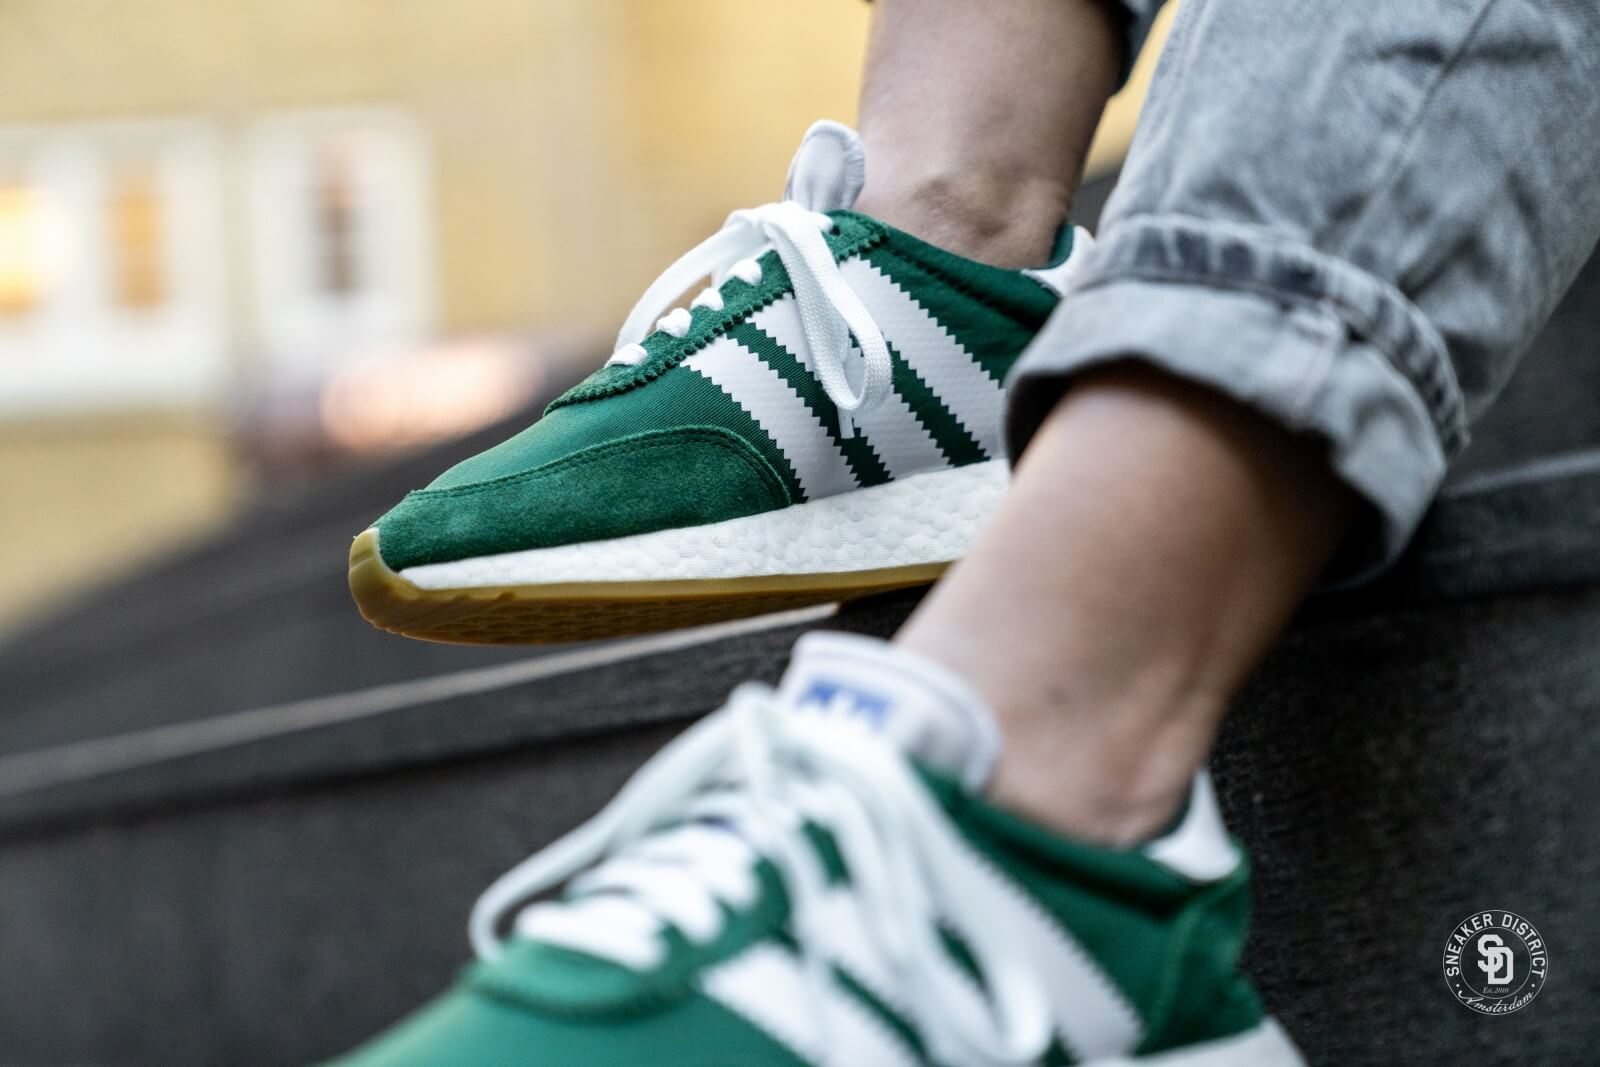 adidas women's green sneakers